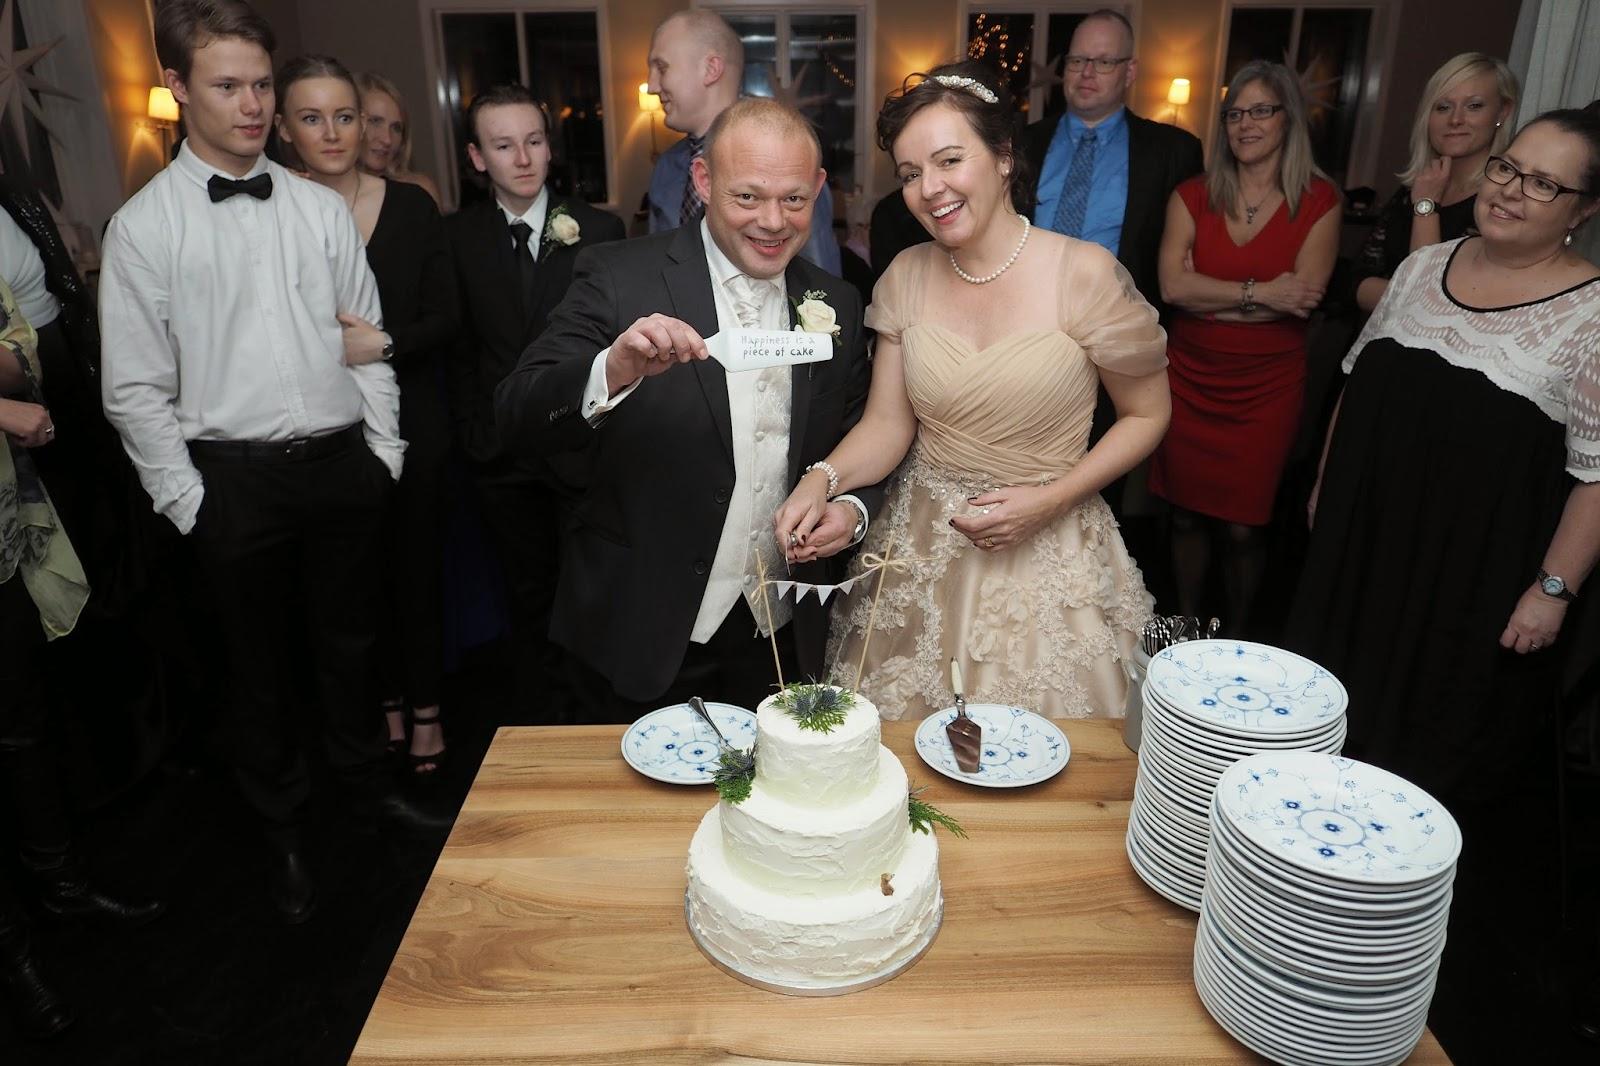 Julie og Christians bryllupskage